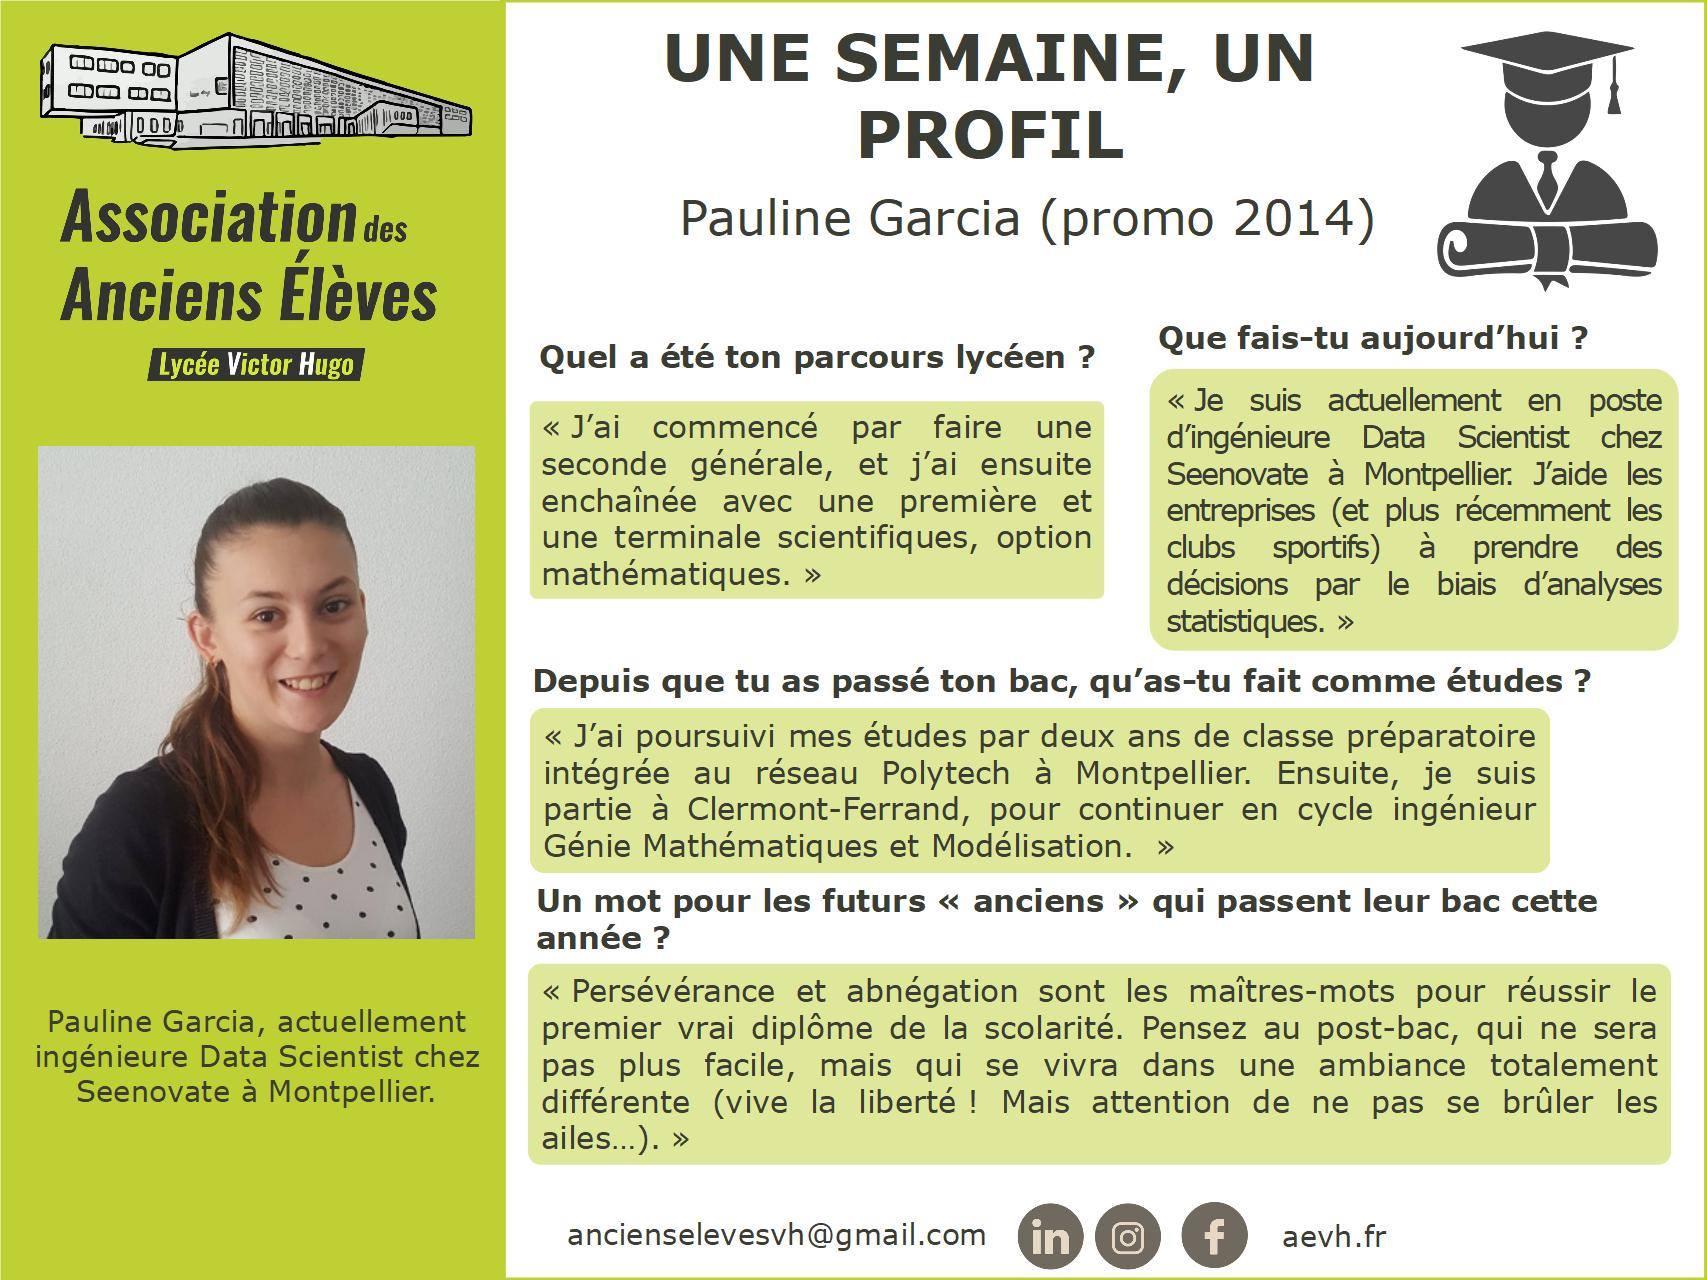 Profil_Pauline_Garcia